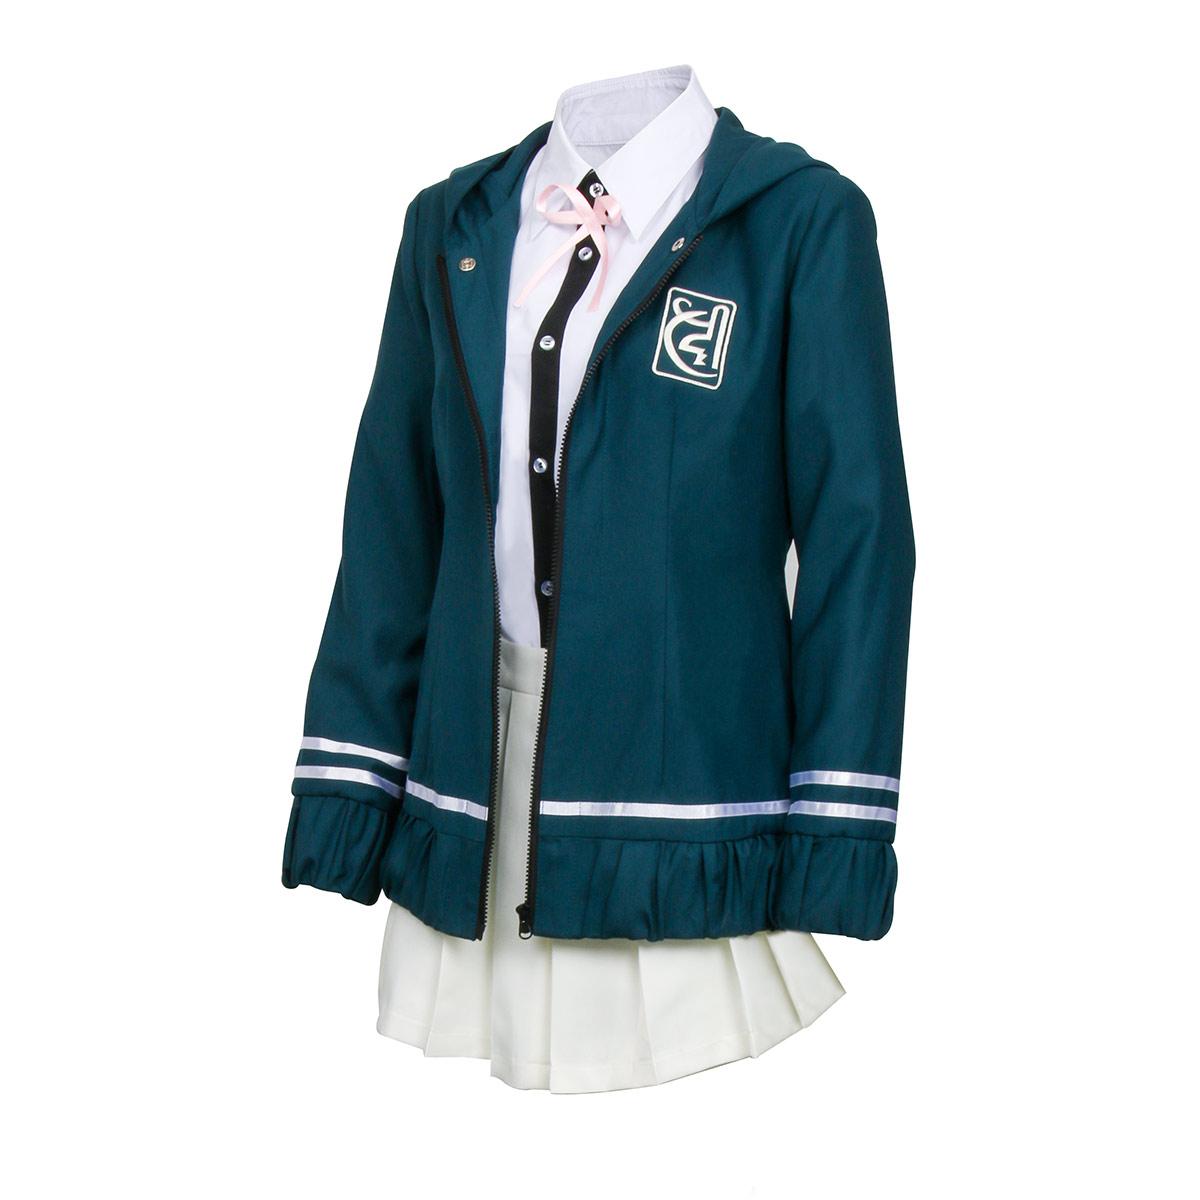 Danganronpa Break Chiaki Nanami Dress School Girl Cosplay Uniform Costume Set